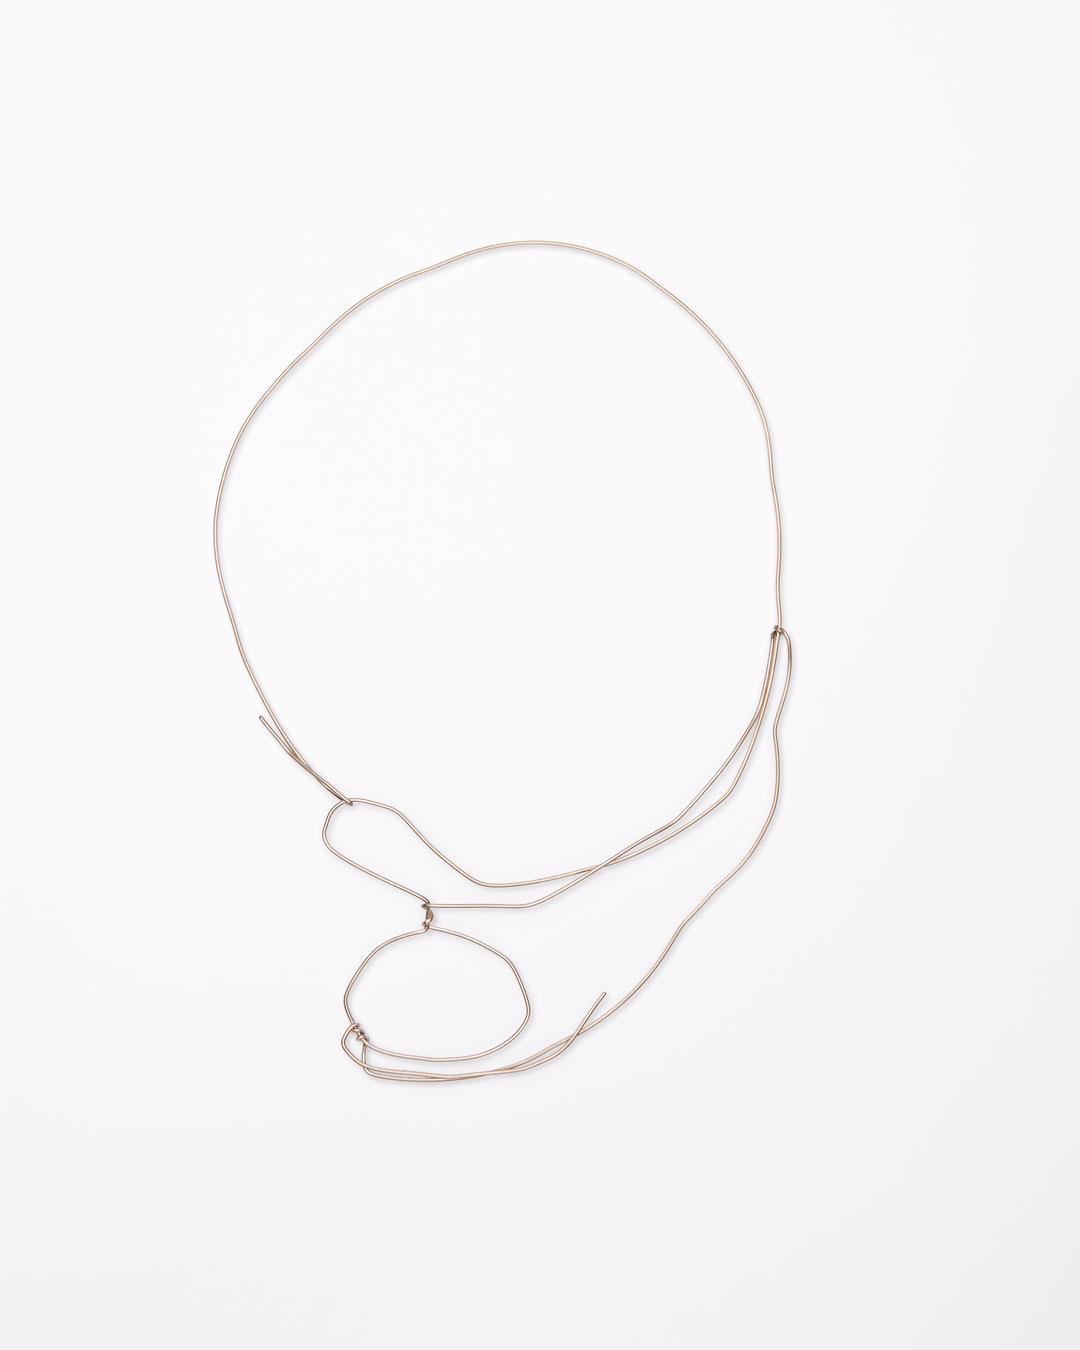 Iris Bodemer, Notizen (Notes), 2016, necklace; gold 585/000, 240 x 170 x 10 mm, €4000